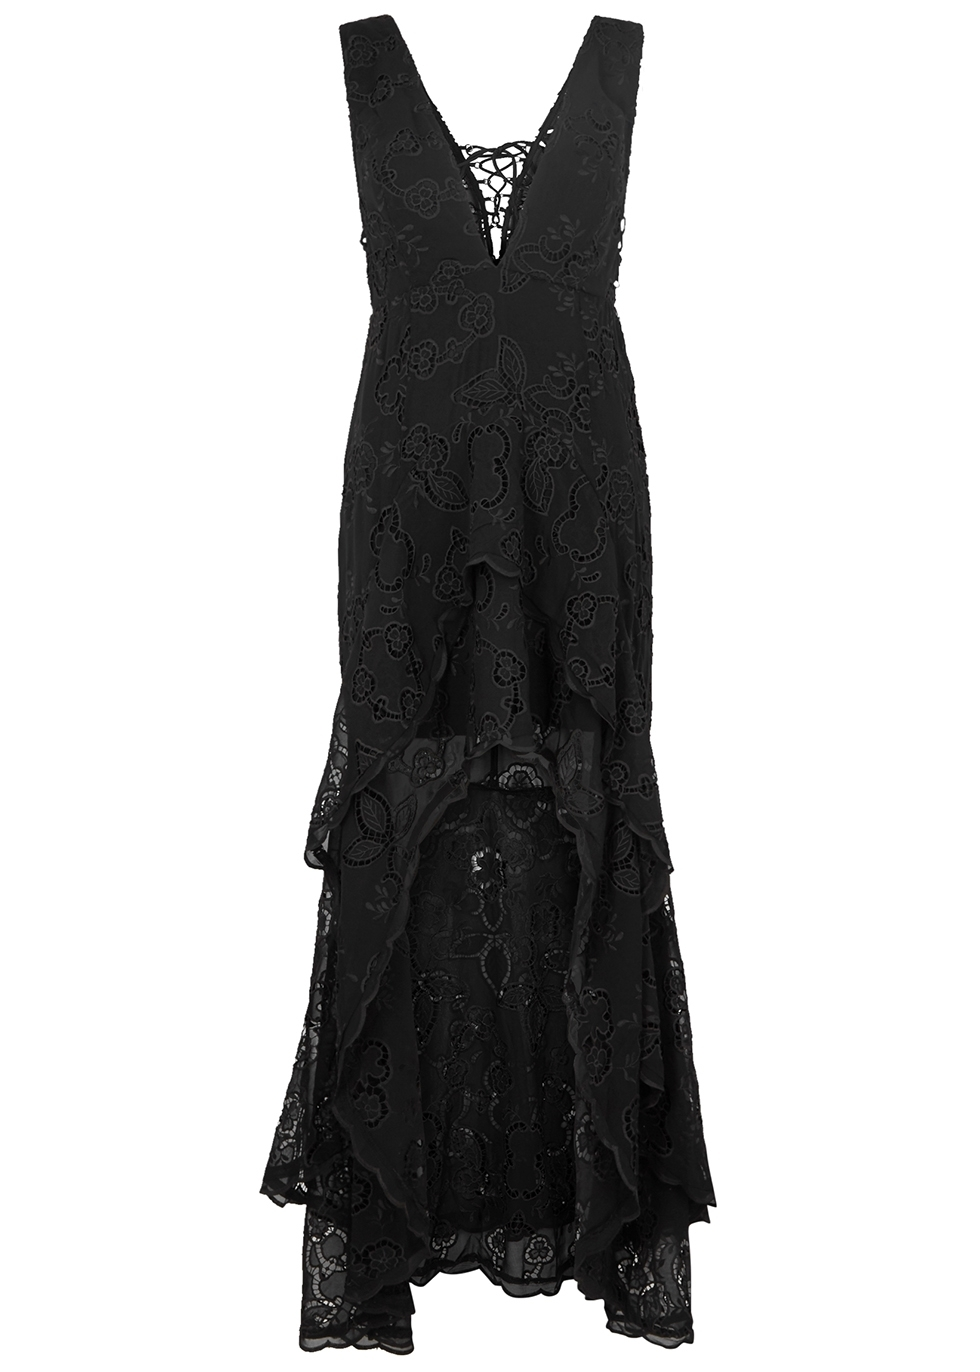 cc5027ba5dd Designer Dresses   Designer Gowns - Harvey Nichols